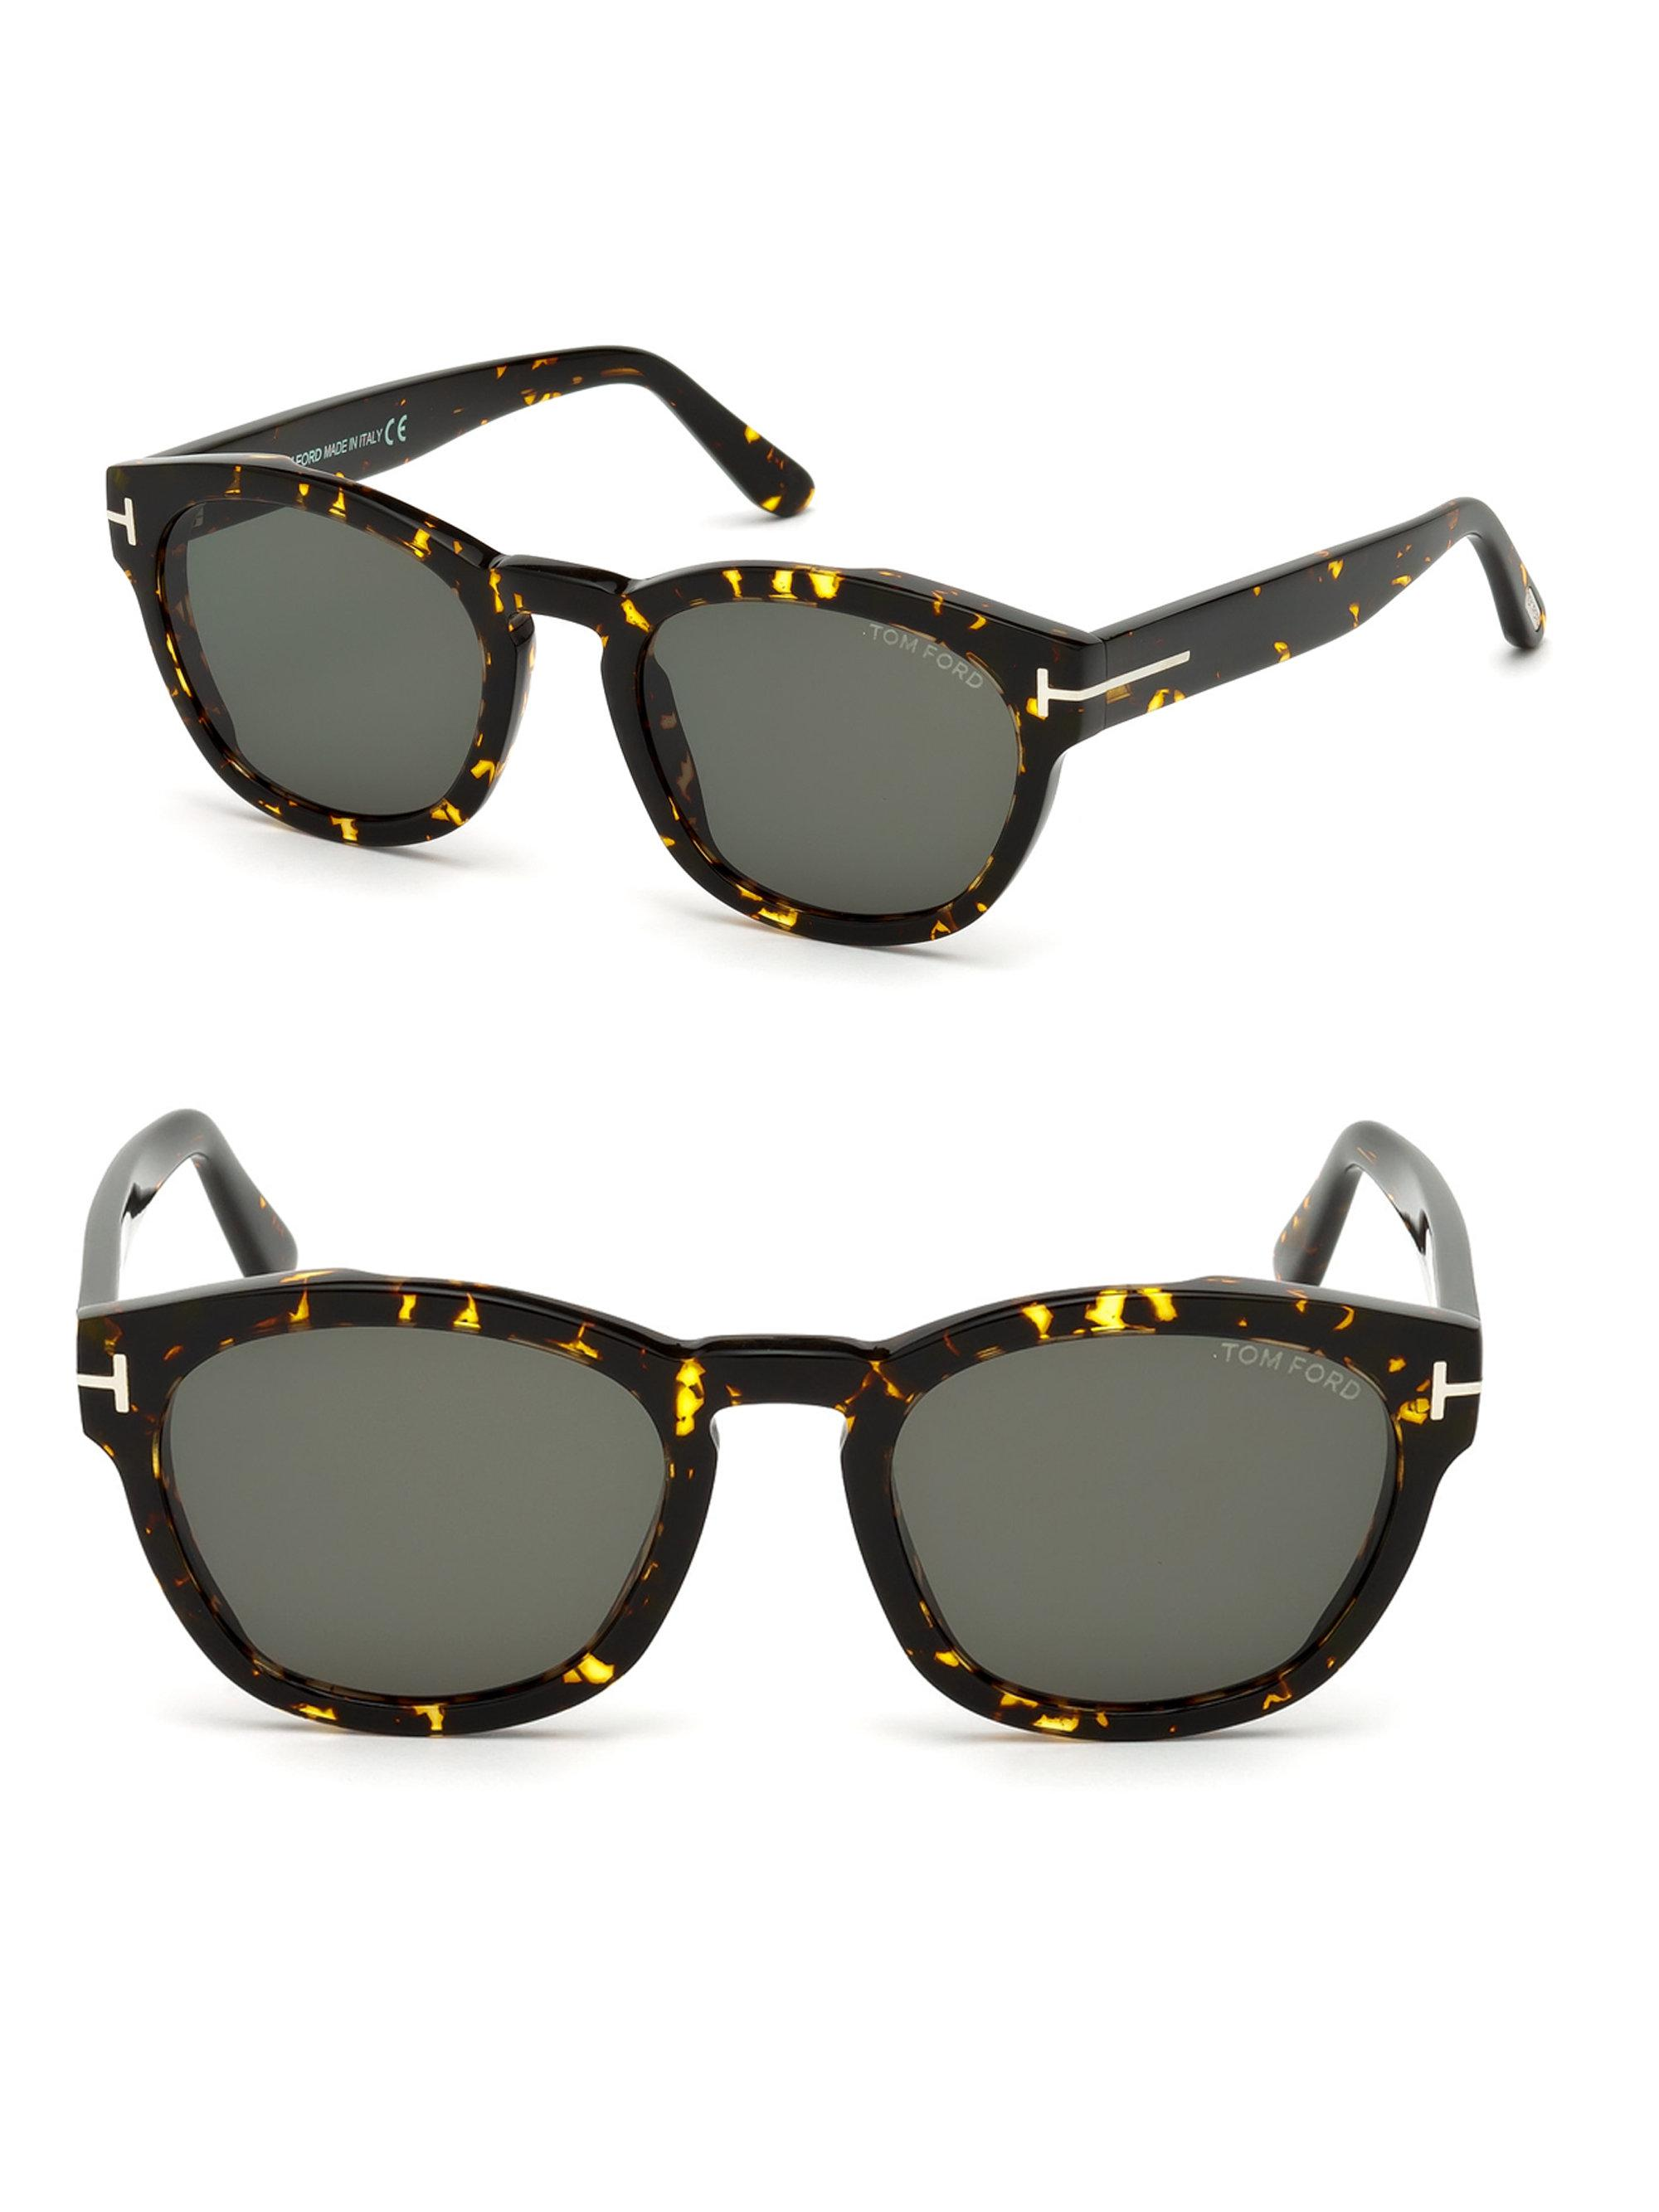 899d6b21636 Tom Ford 51mm Bryan Round Tortoise Shell Sunglasses in Brown for Men ...